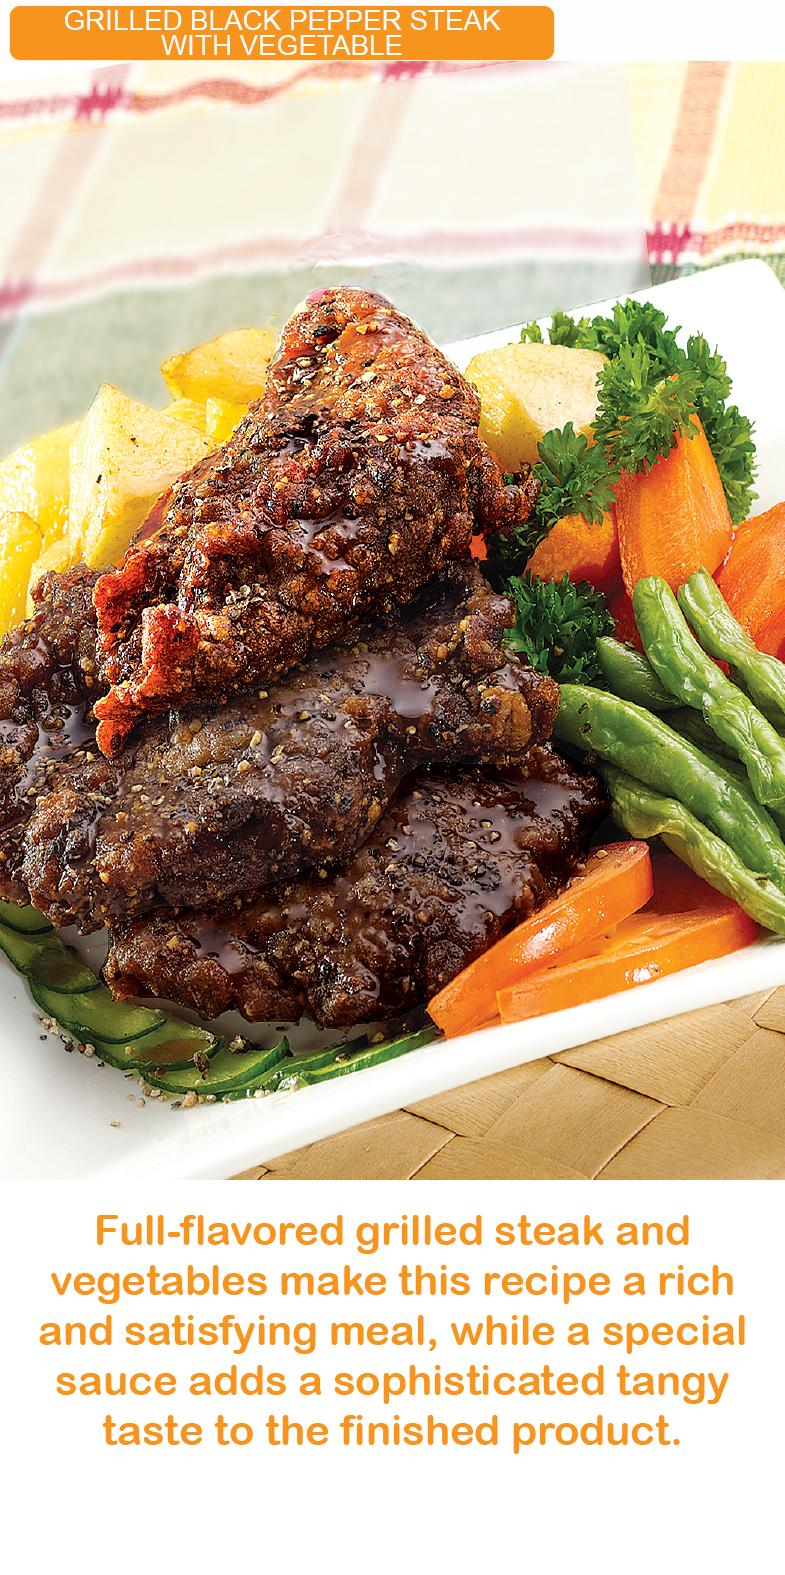 grilled black pepper steak with vegetable kfi sri kulai kinabalu food industries signature products malaysia rte